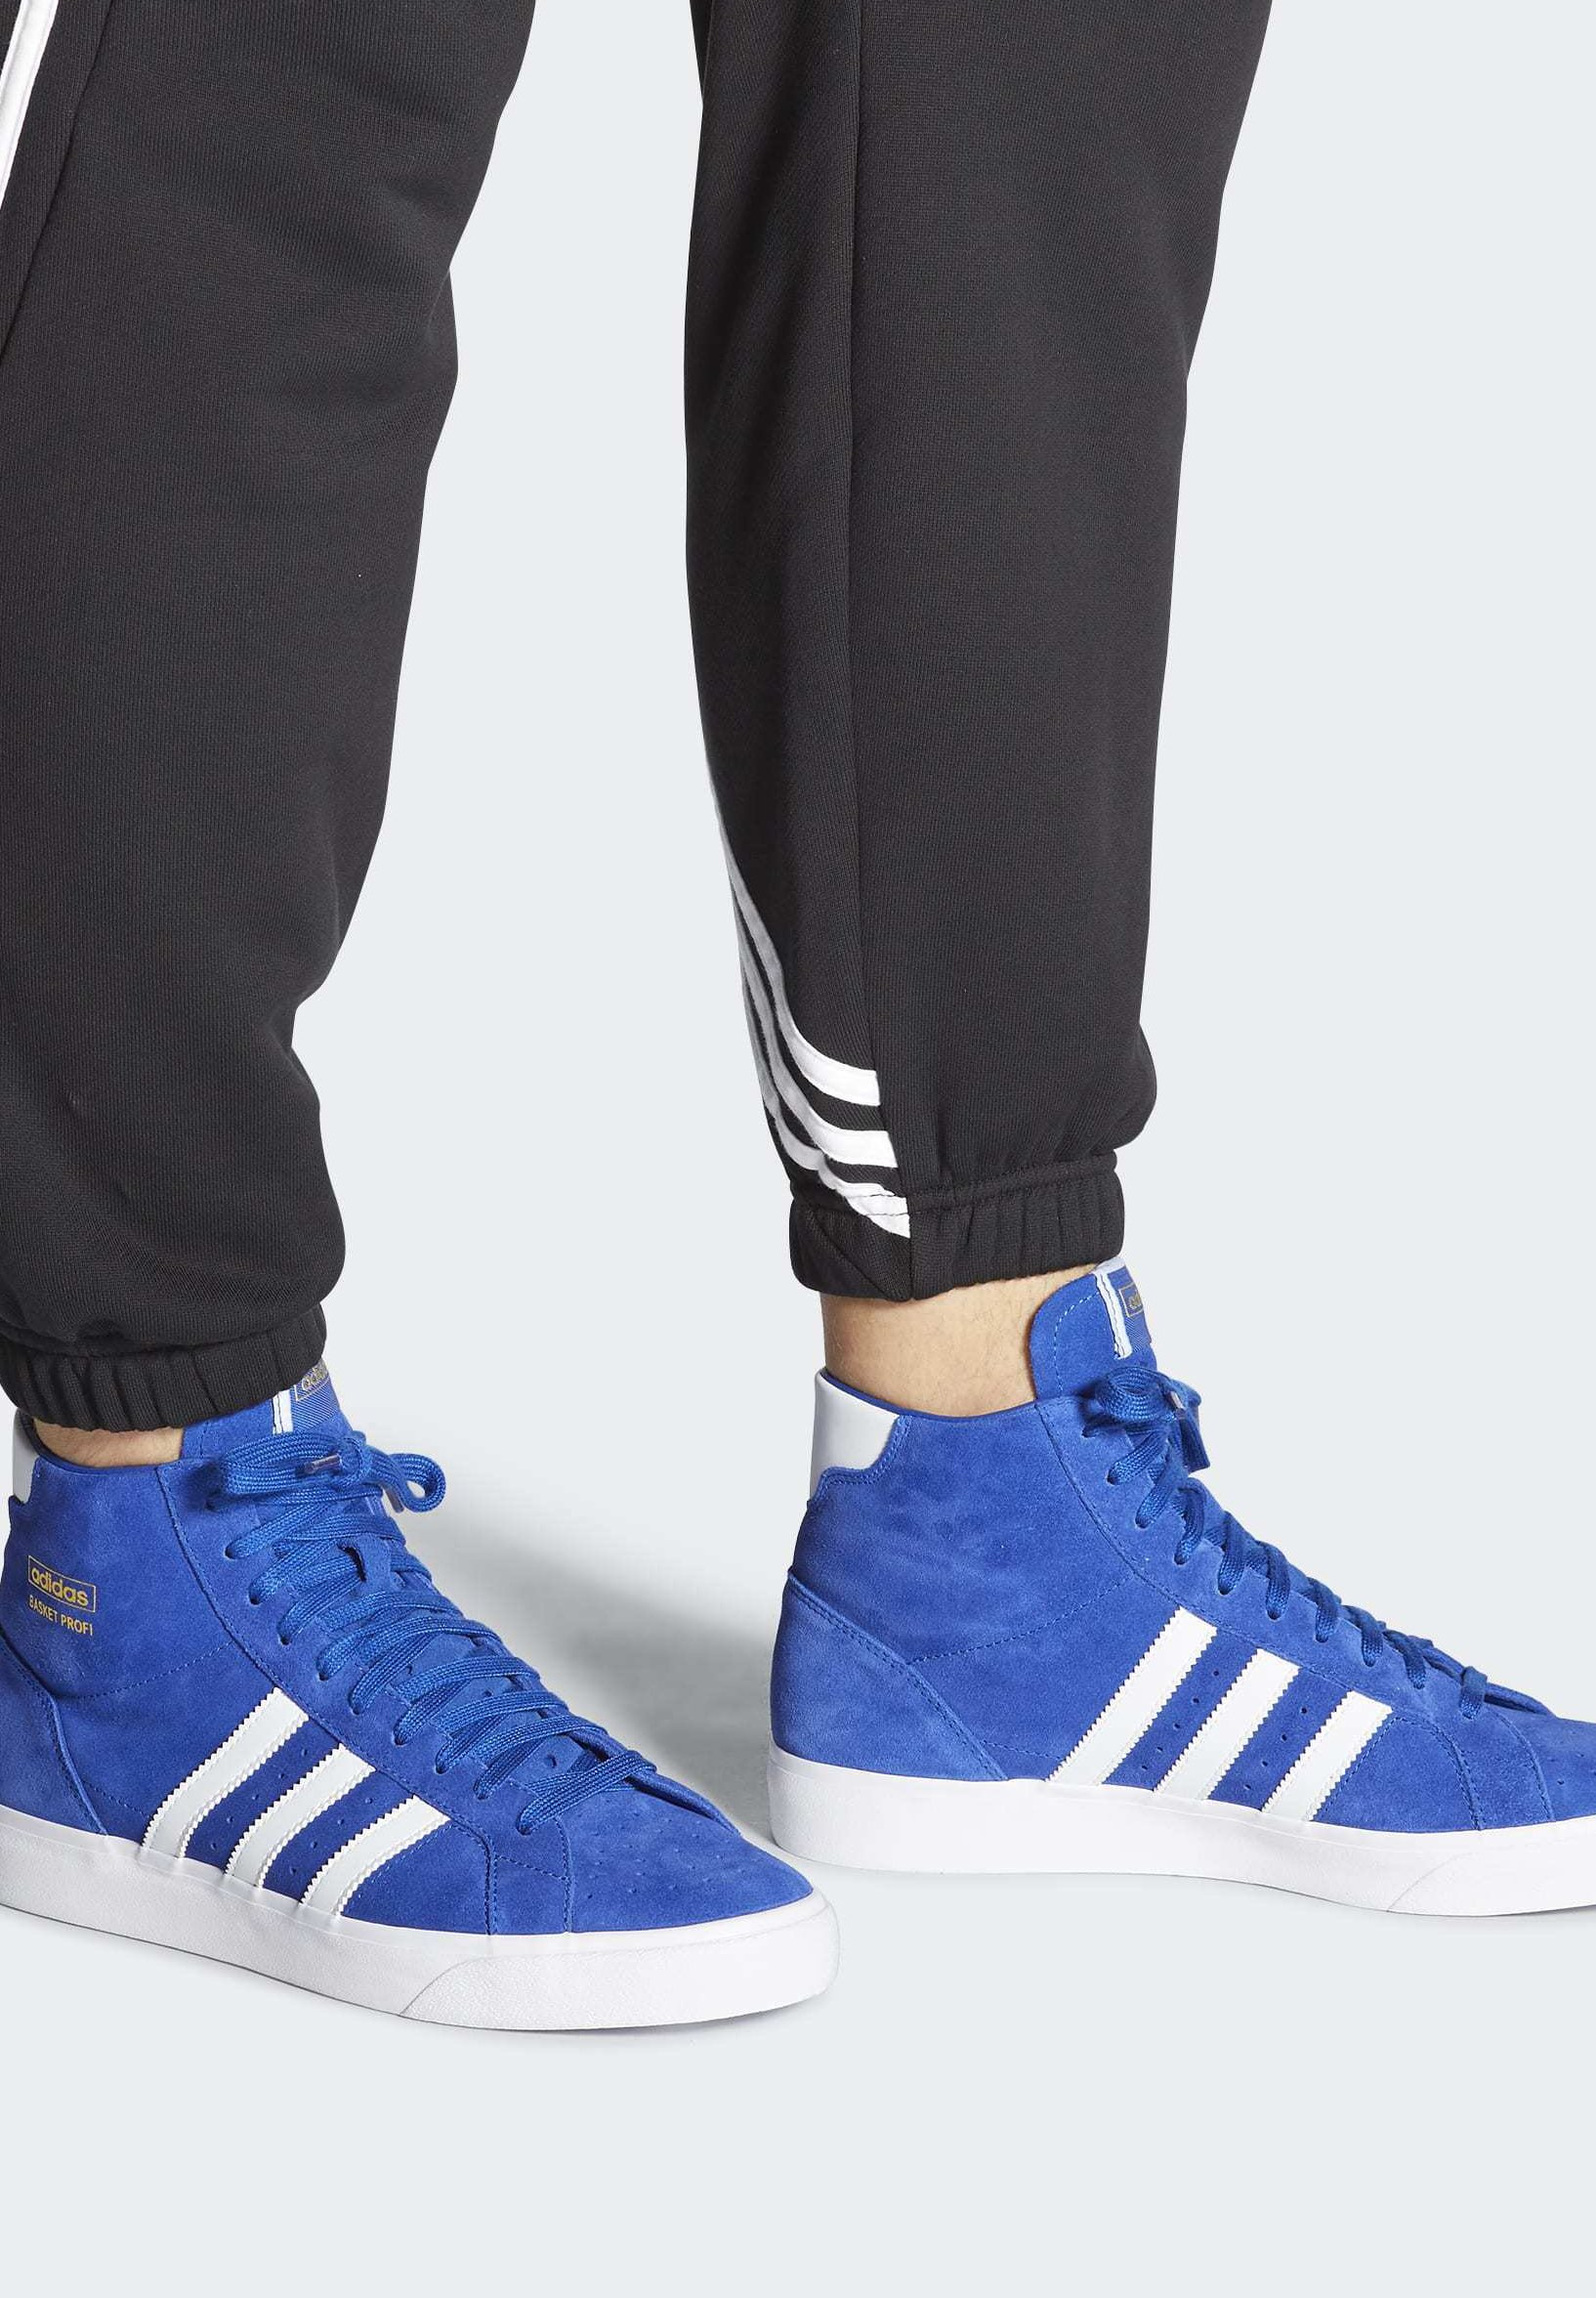 Geringster Preis adidas Originals Sneaker high - blue | Damenbekleidung 2020